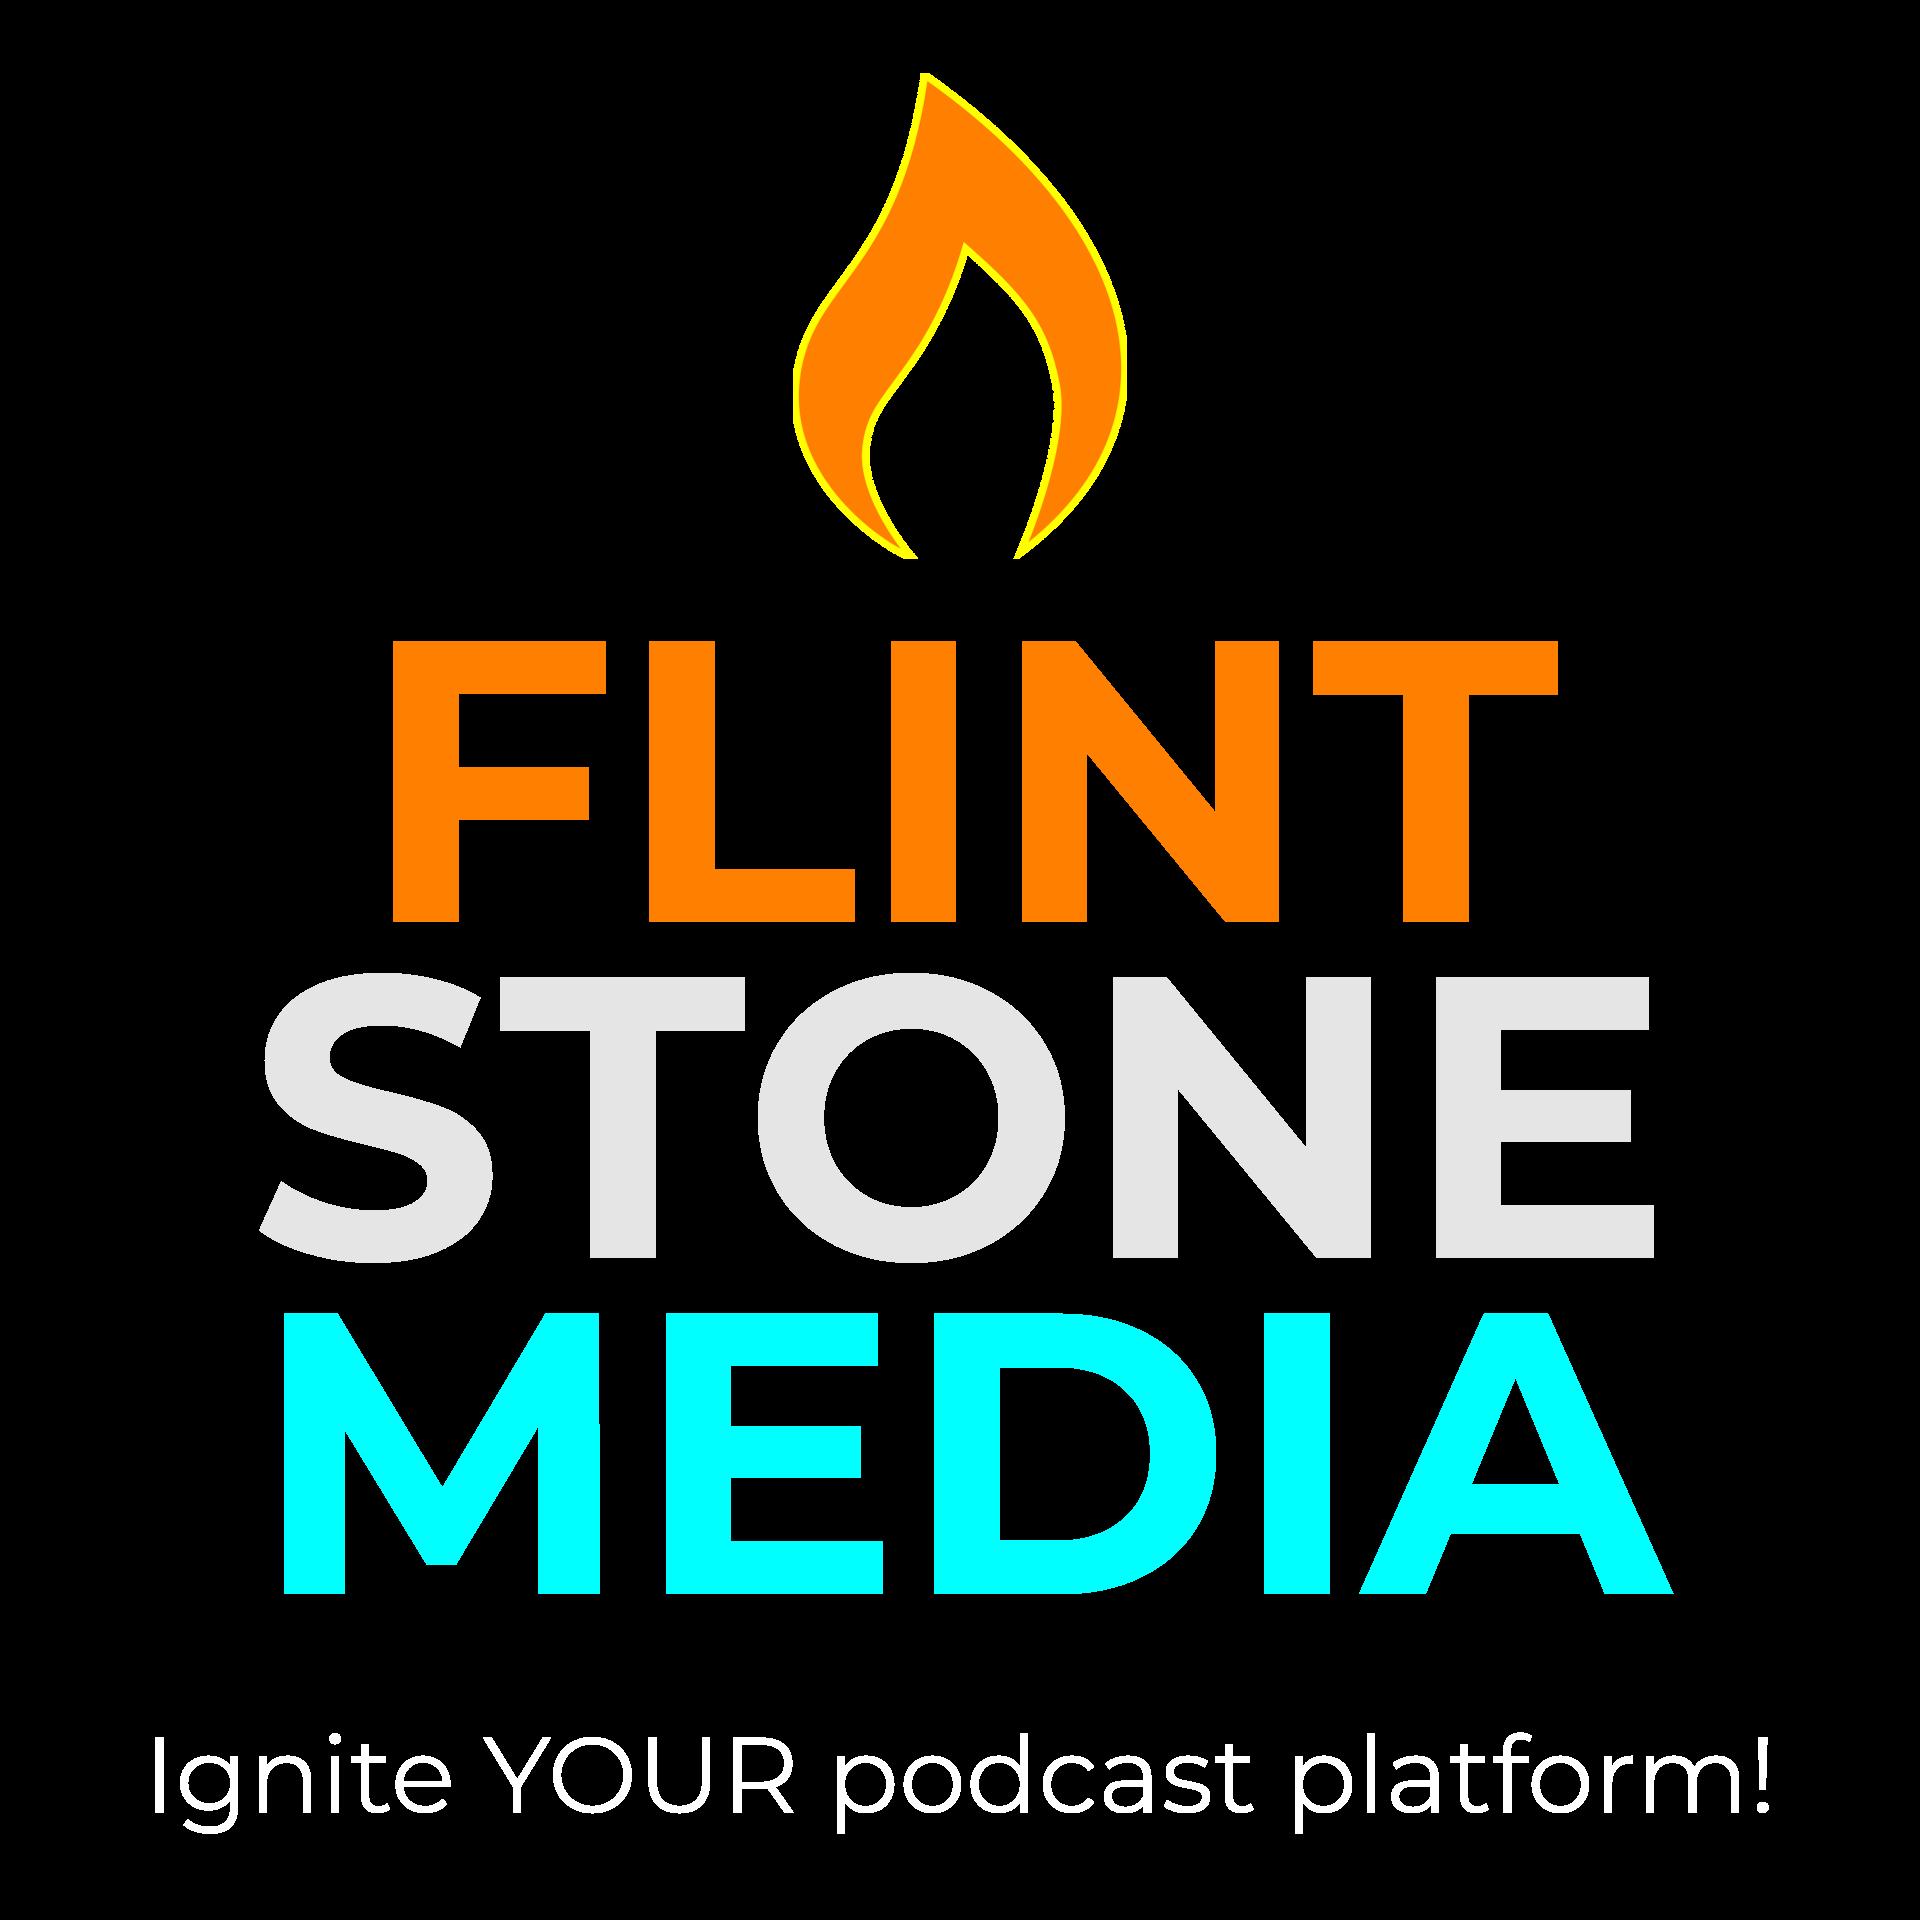 Ignite your podcast platform!